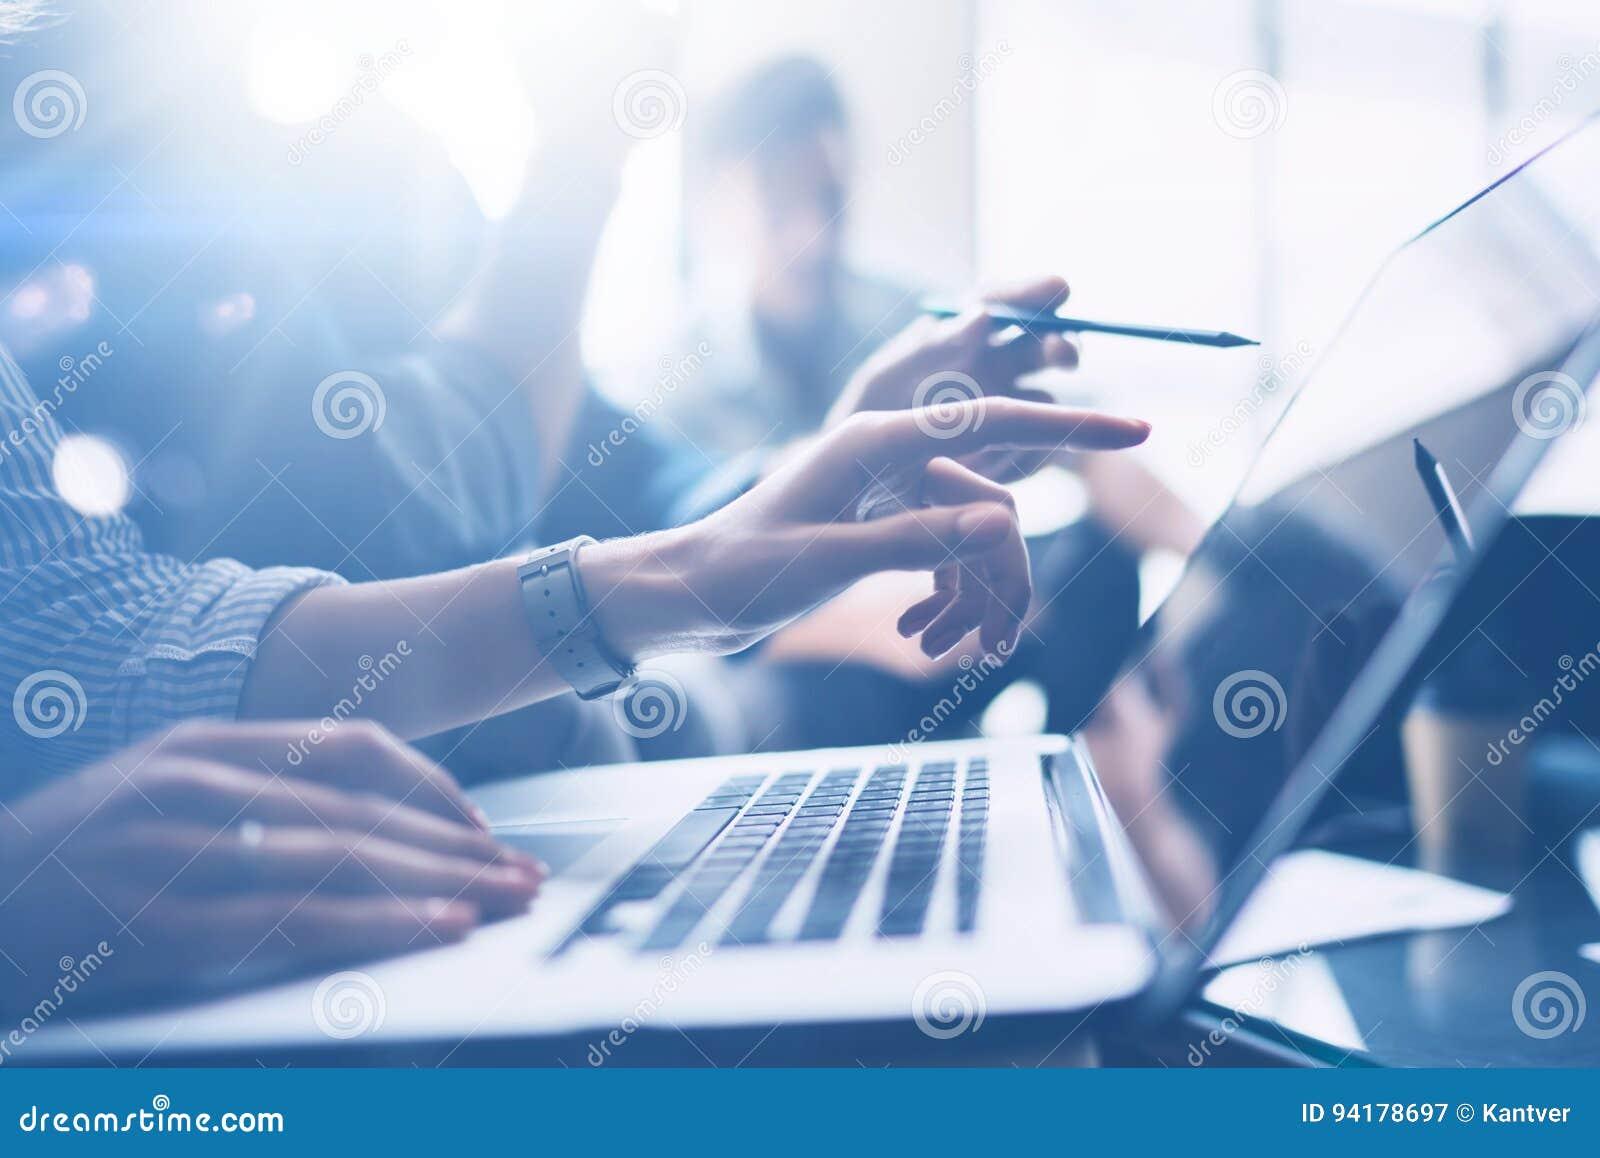 3d企业概念查出的会议回报白色 特写镜头观点的工友在现代办公室合作与移动计算机一起使用 分析事务